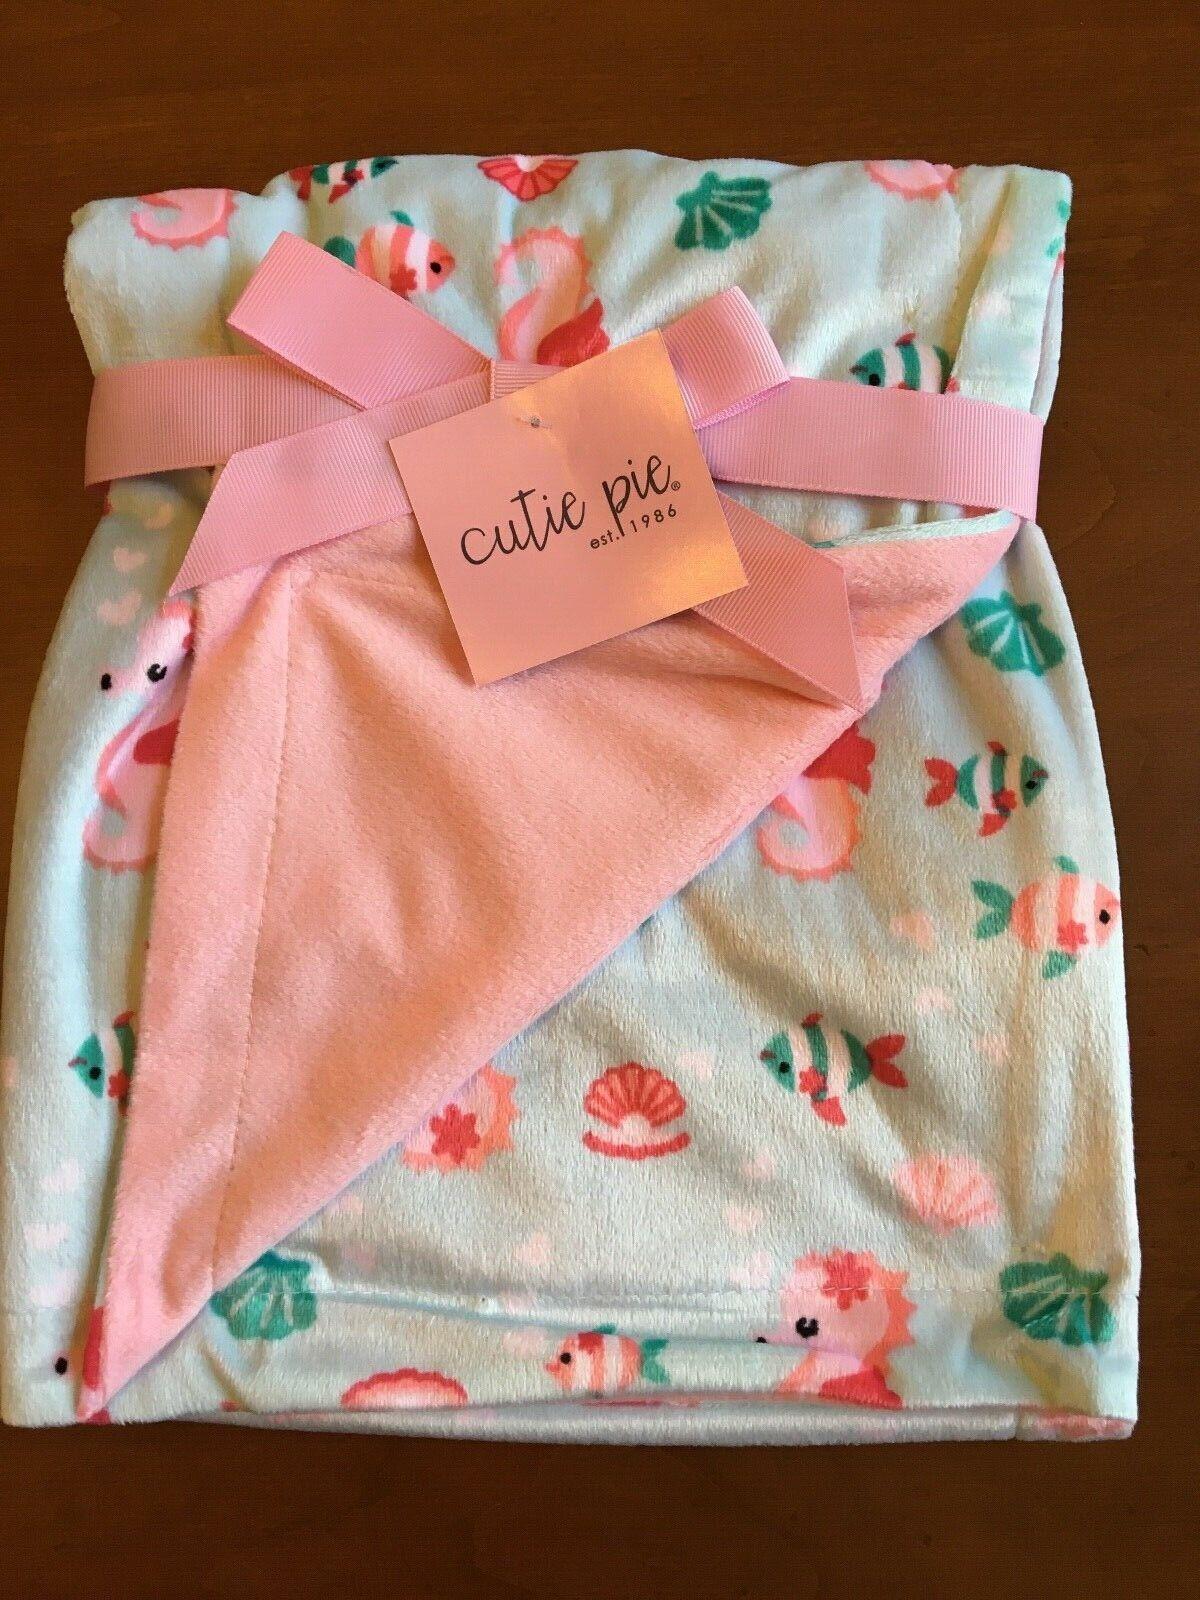 "Cutie Pie Baby Blanket MicroMink 30"" x 30"" Mint Pink Fish Se"